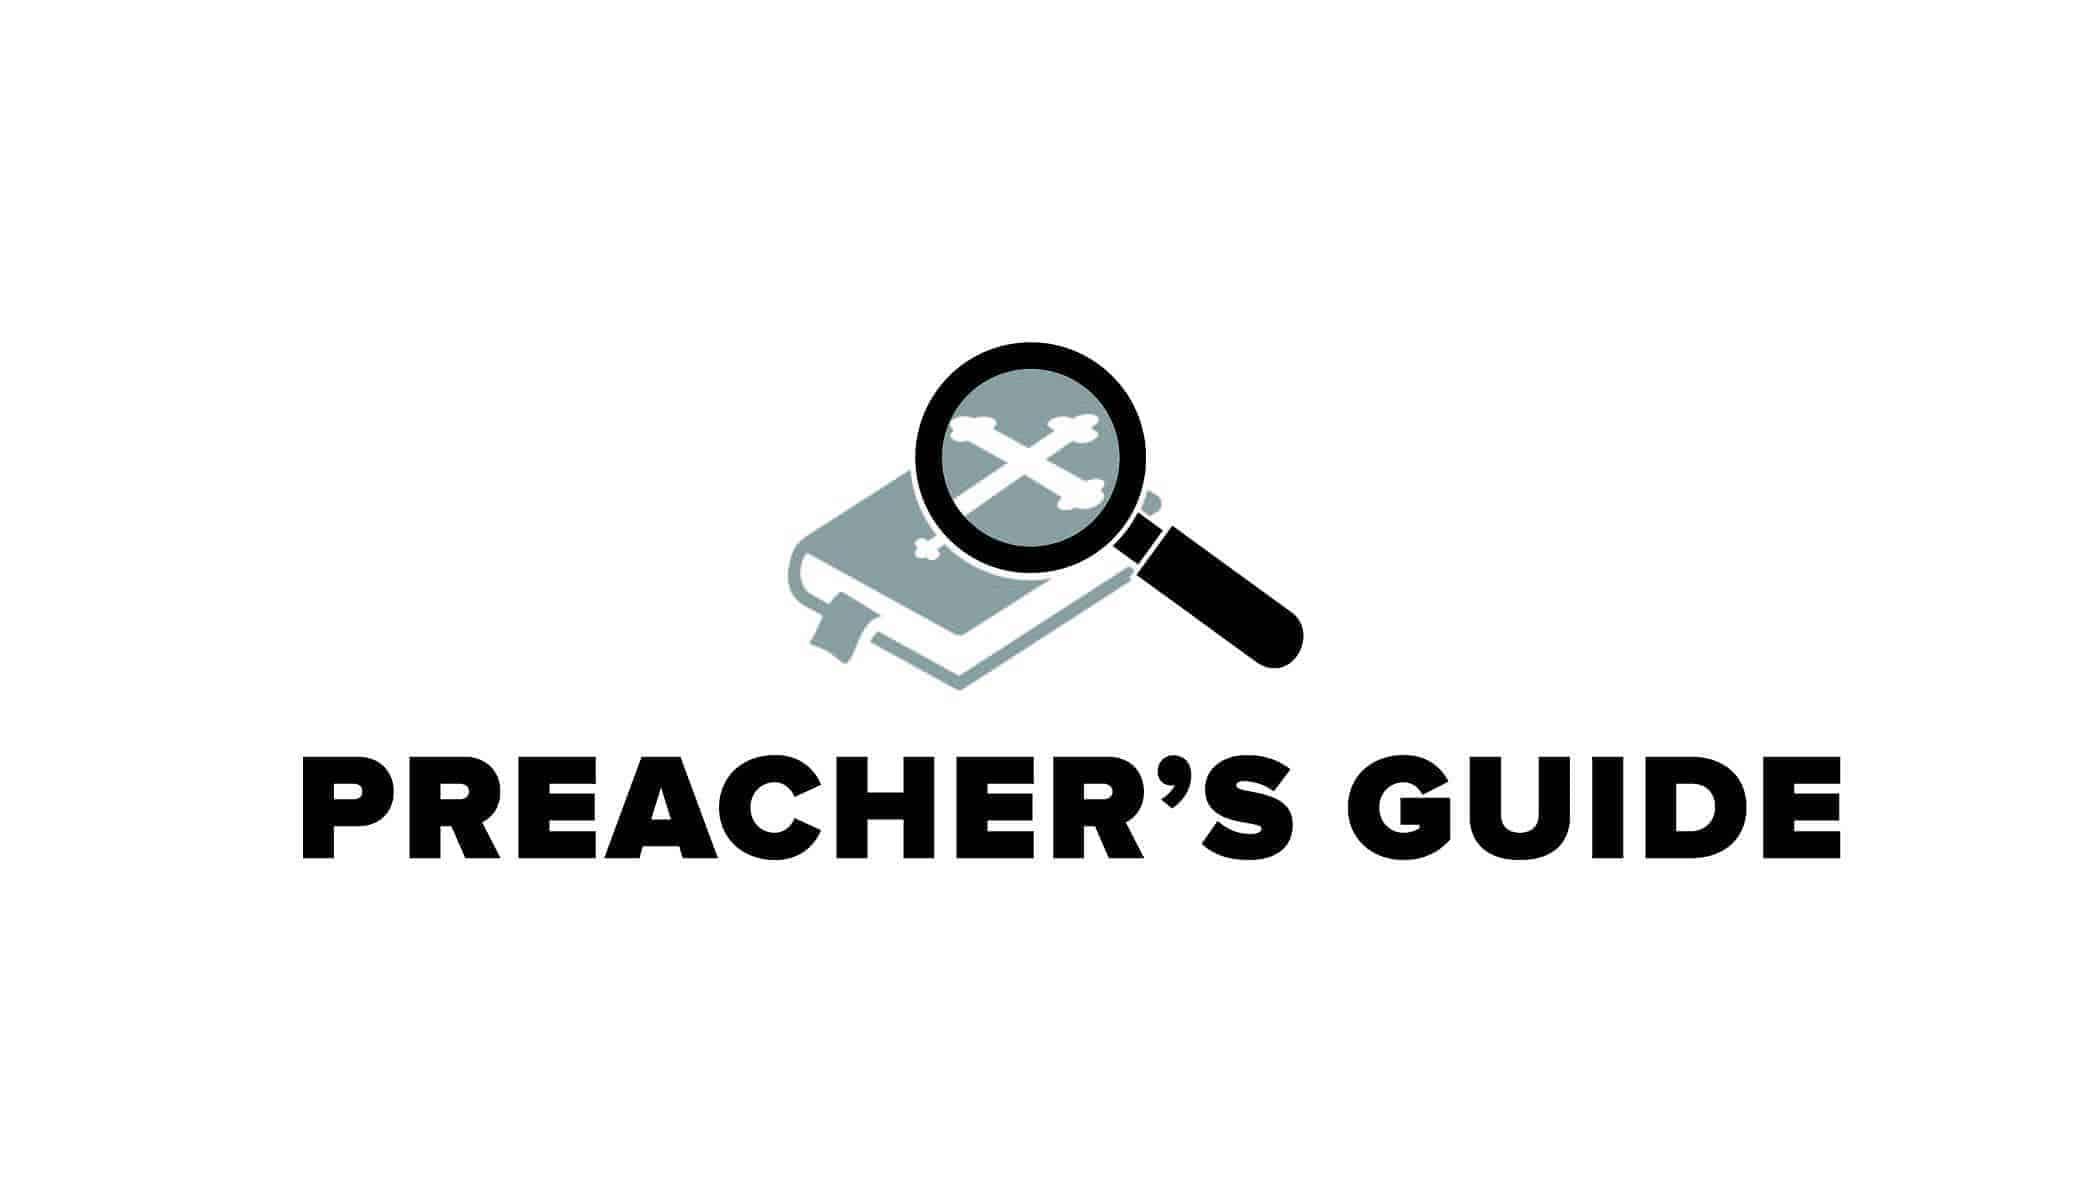 preachers guide logo